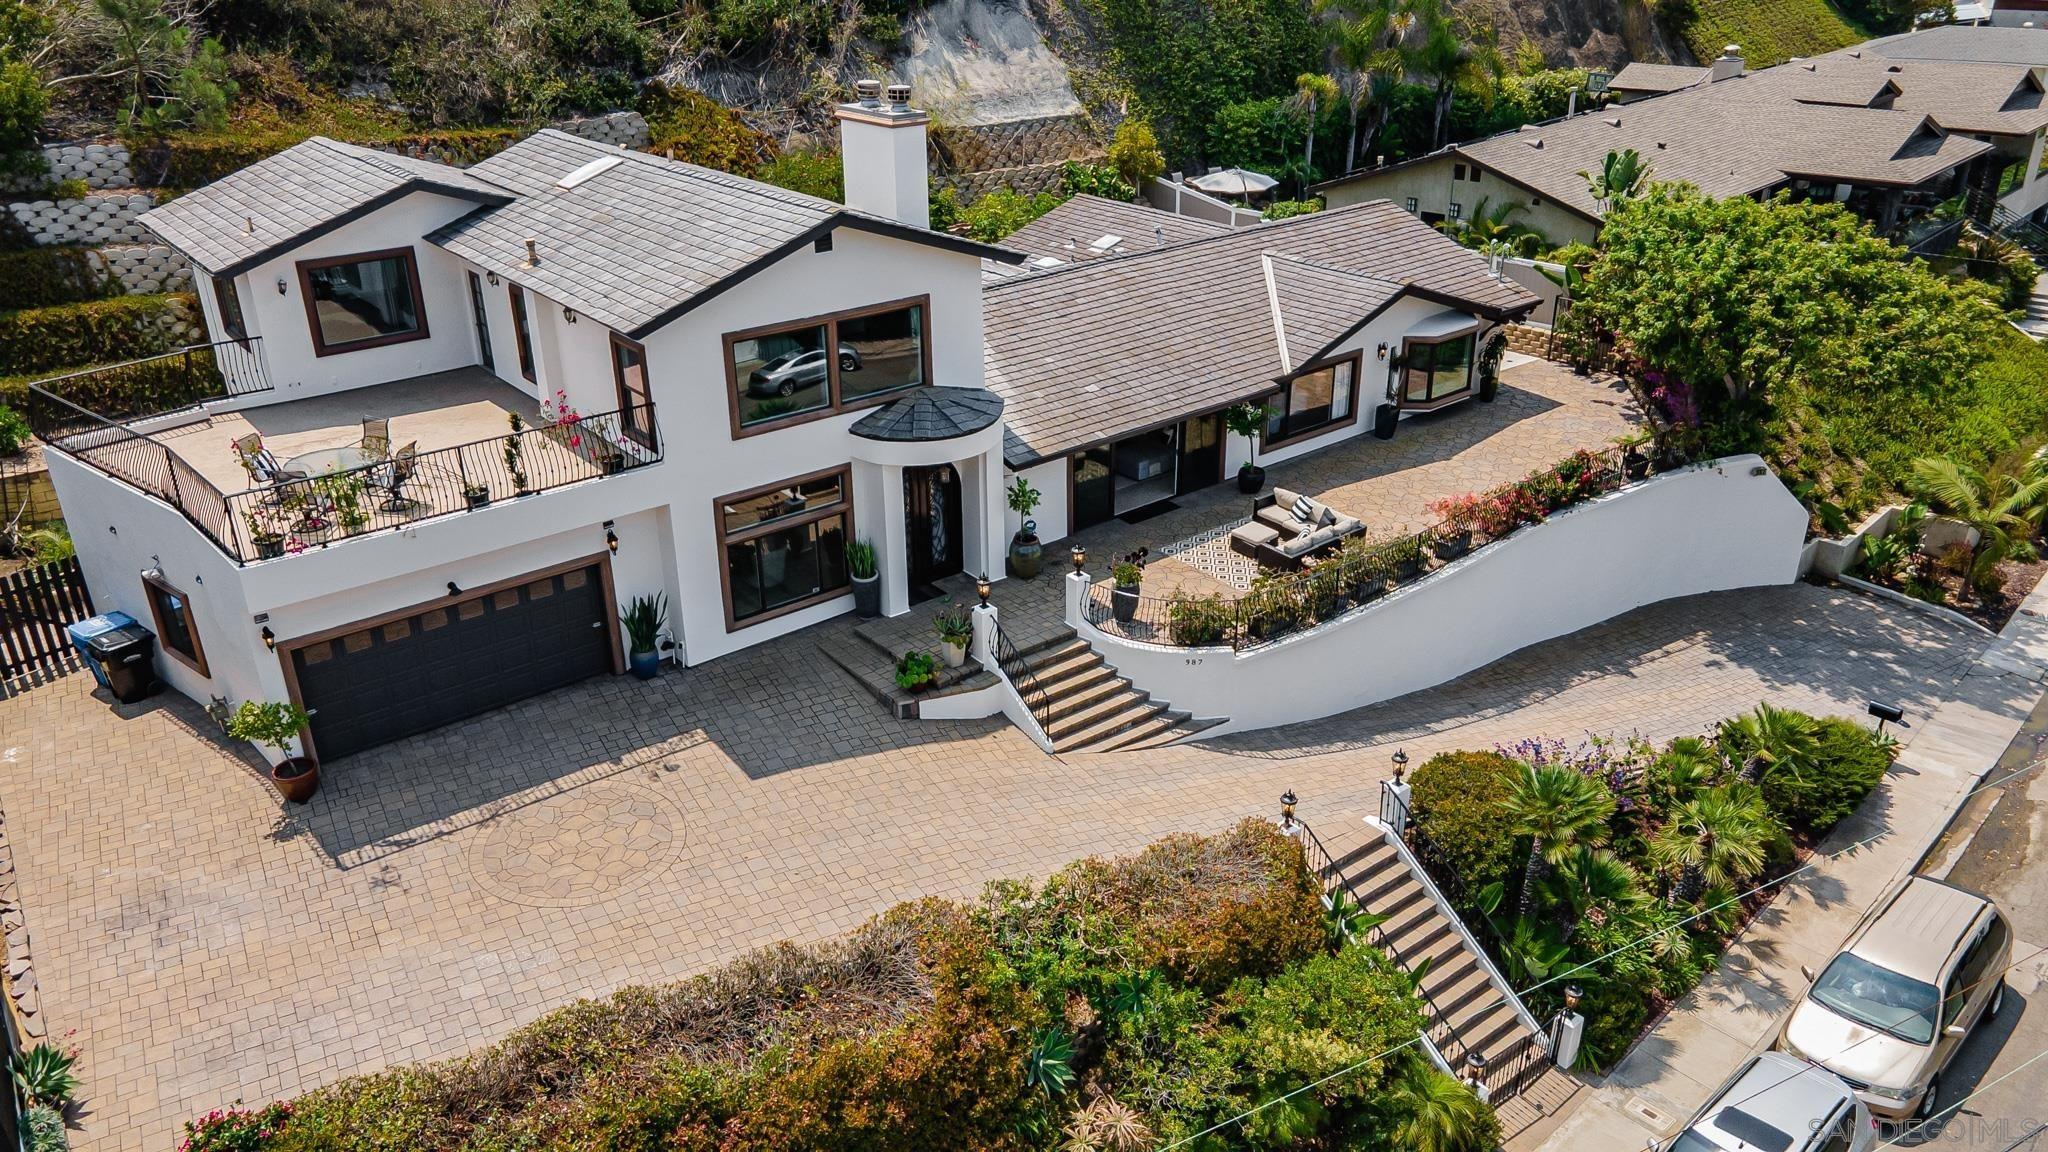 Main Photo: LA JOLLA House for sale : 6 bedrooms : 987 Muirlands Vista Way